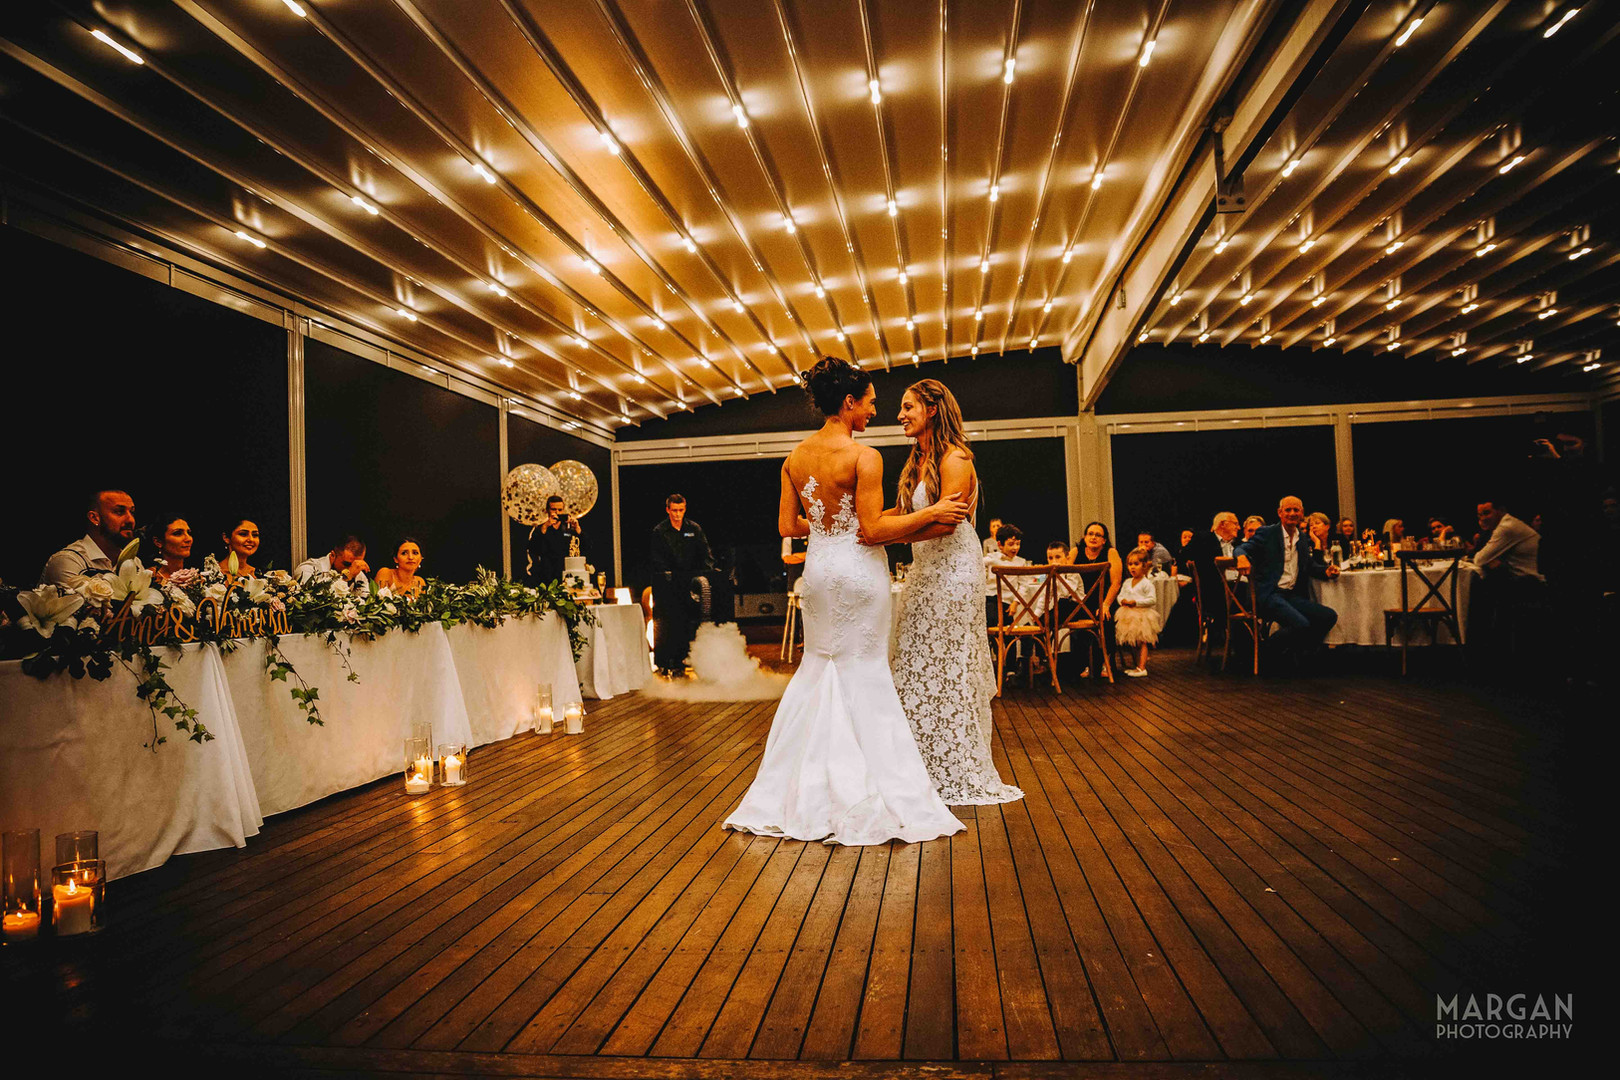 WeddingWebsite_Compressed_A4-1.jpg